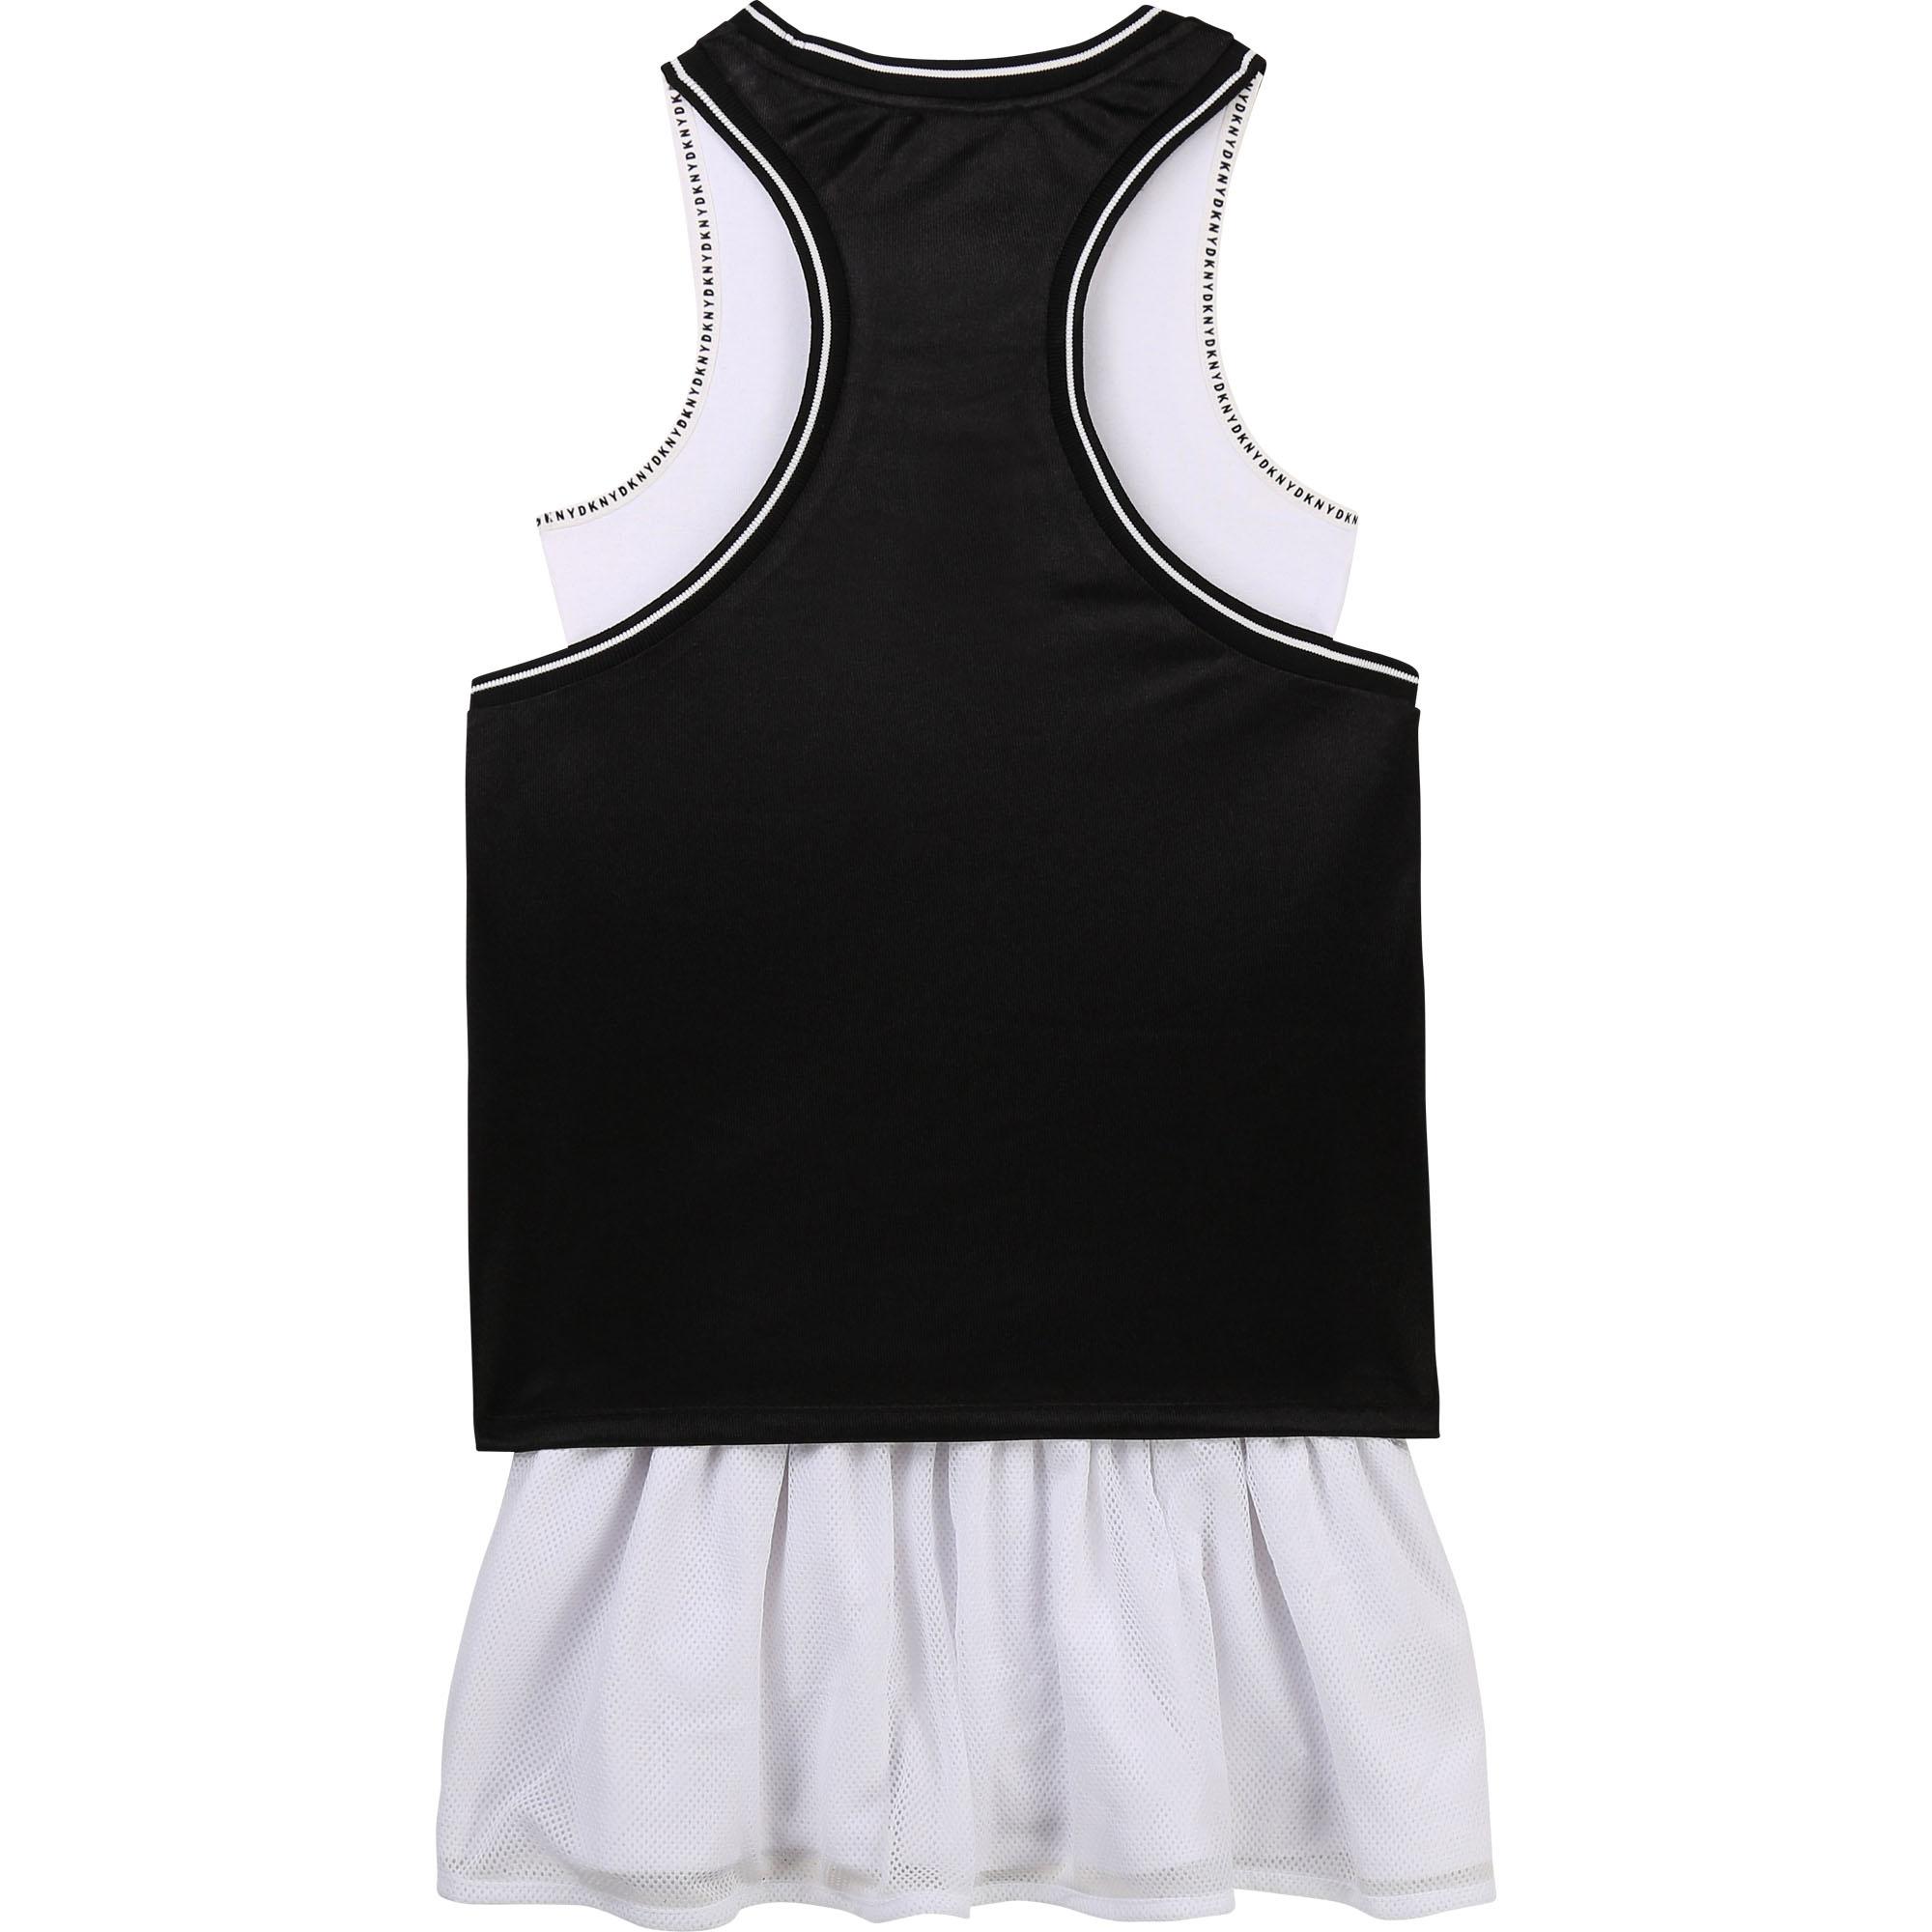 DKNY robe 2 en 1 avec patch brodé-2